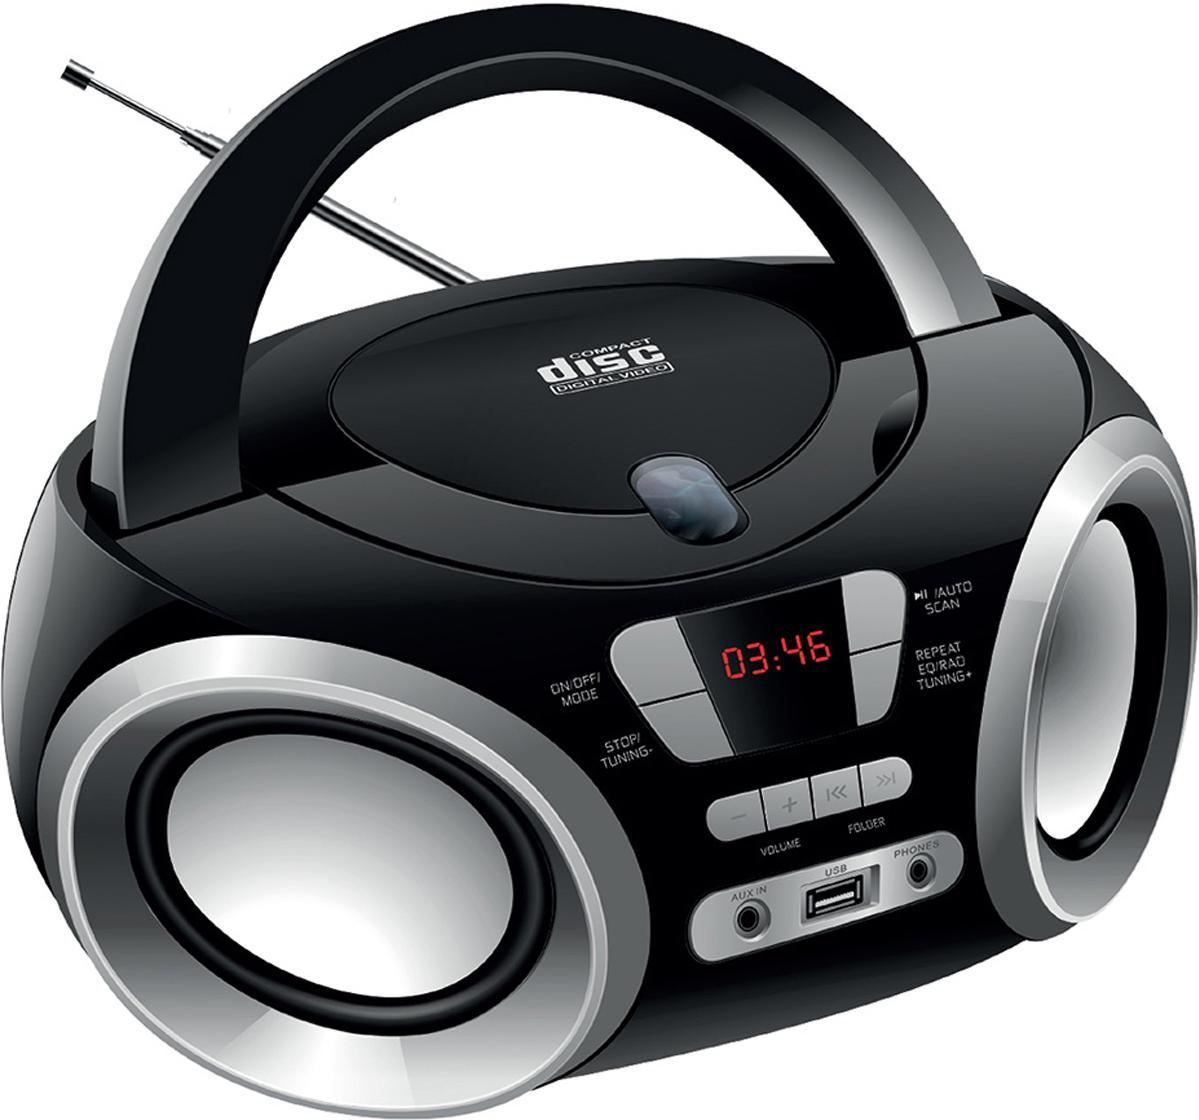 Hyundai H-PCD100, Black Silver магнитолаH-PCD100Аудиомагнитола Hyundai H-PCD100 черный/серебристый 4Вт/CD/CDRW/MP3/FM(dig)/USB